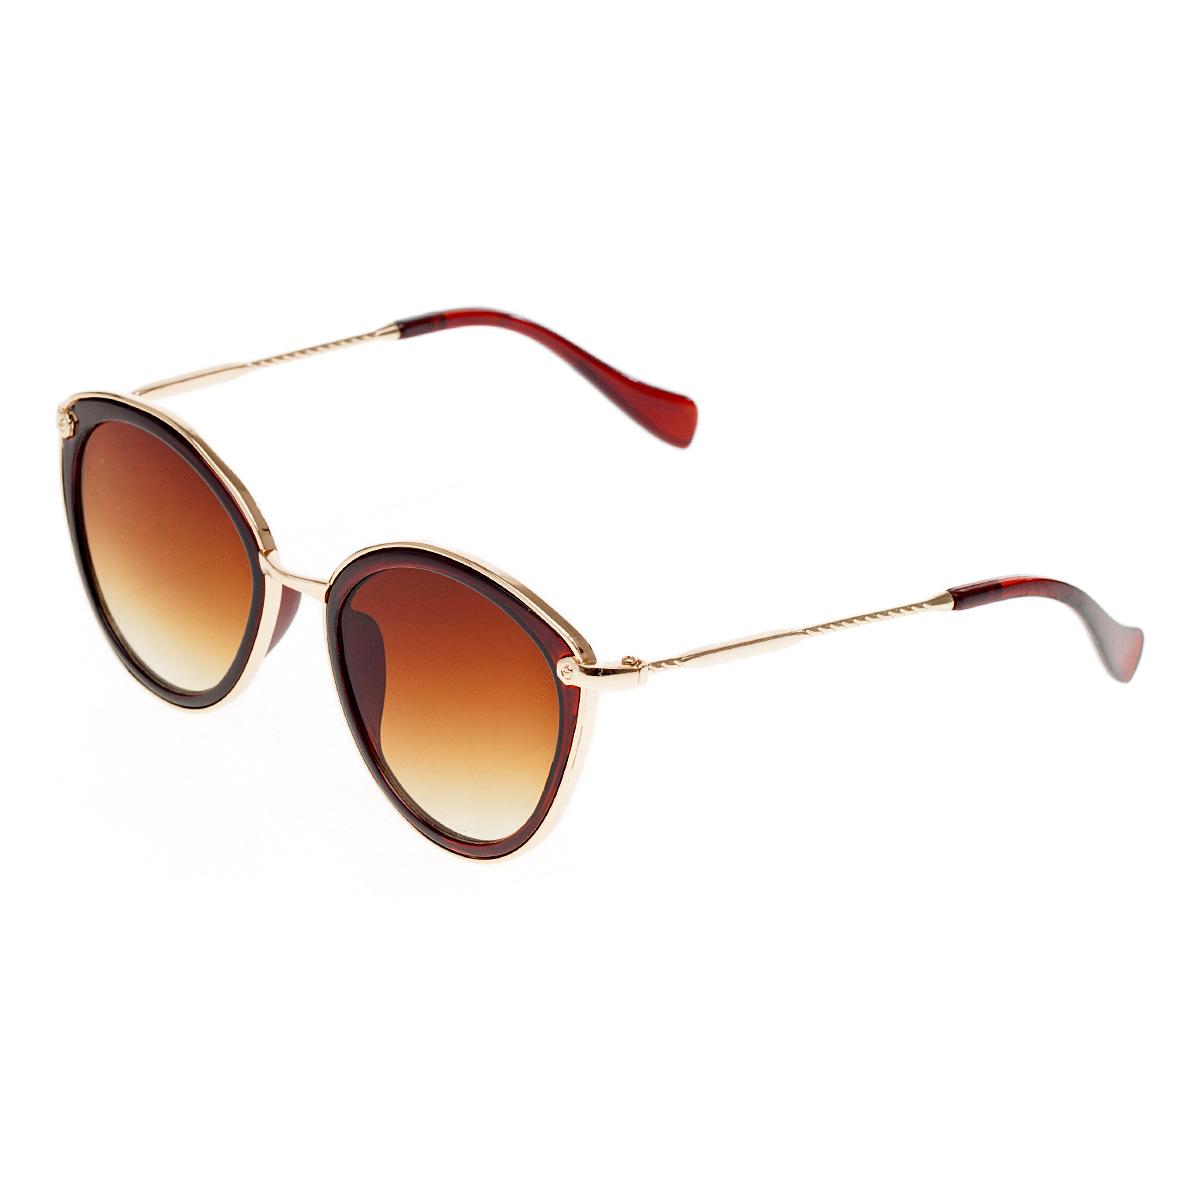 Фото - Очки солнцезащитные Sevenext, 23032-6 очки солнцезащитные sevenext 23032 28